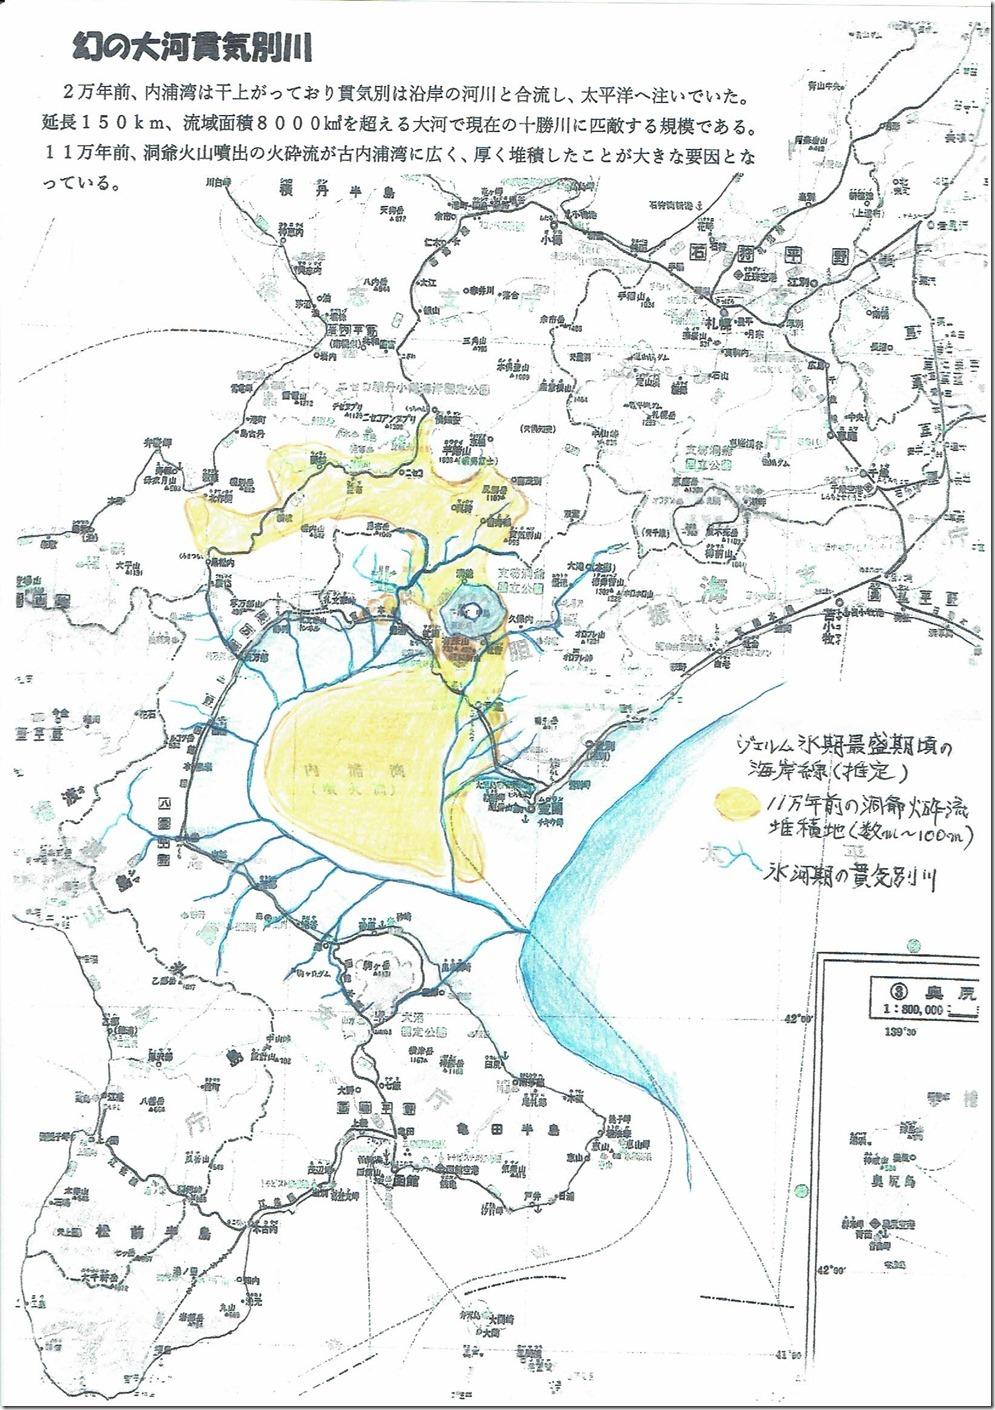 CCF20200201_0001貫気別川2 (2)